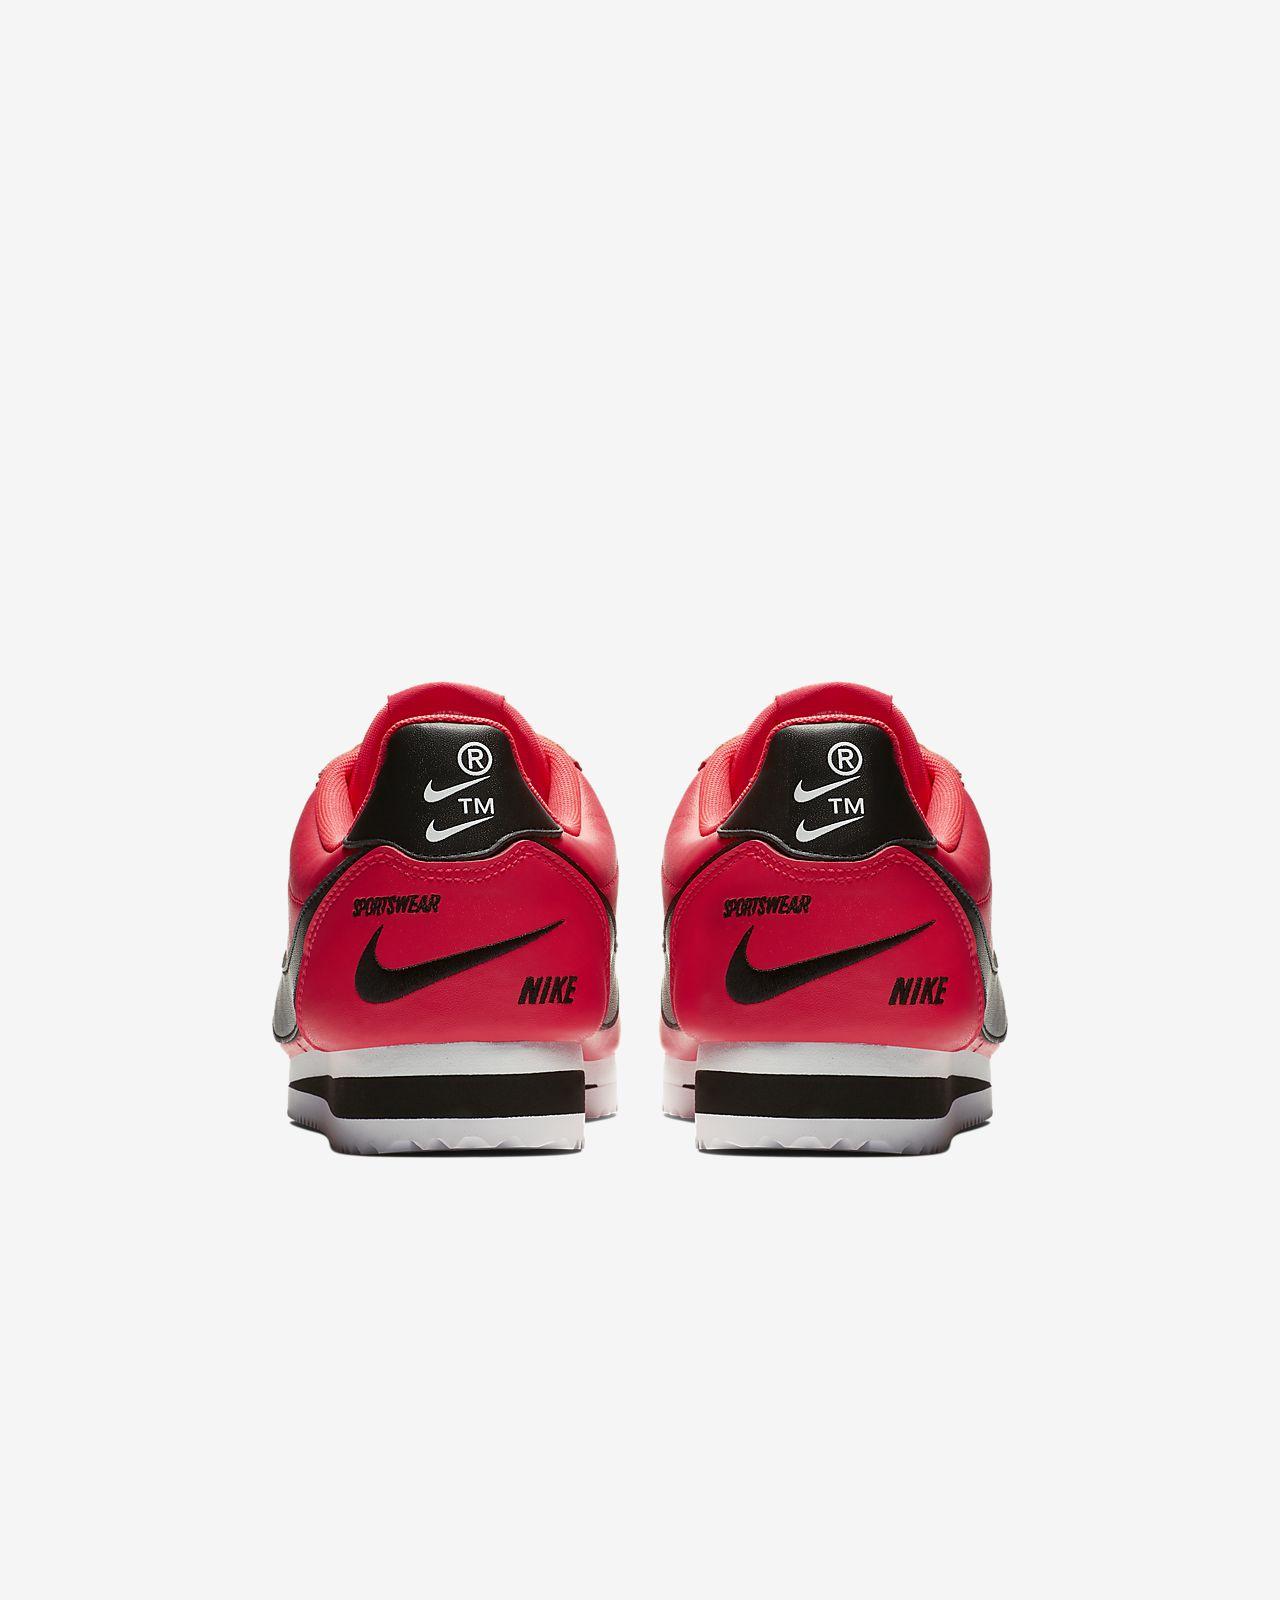 c5ed84d01fc61 Nike Classic Cortez Premium Unisex Shoe. Nike.com NO